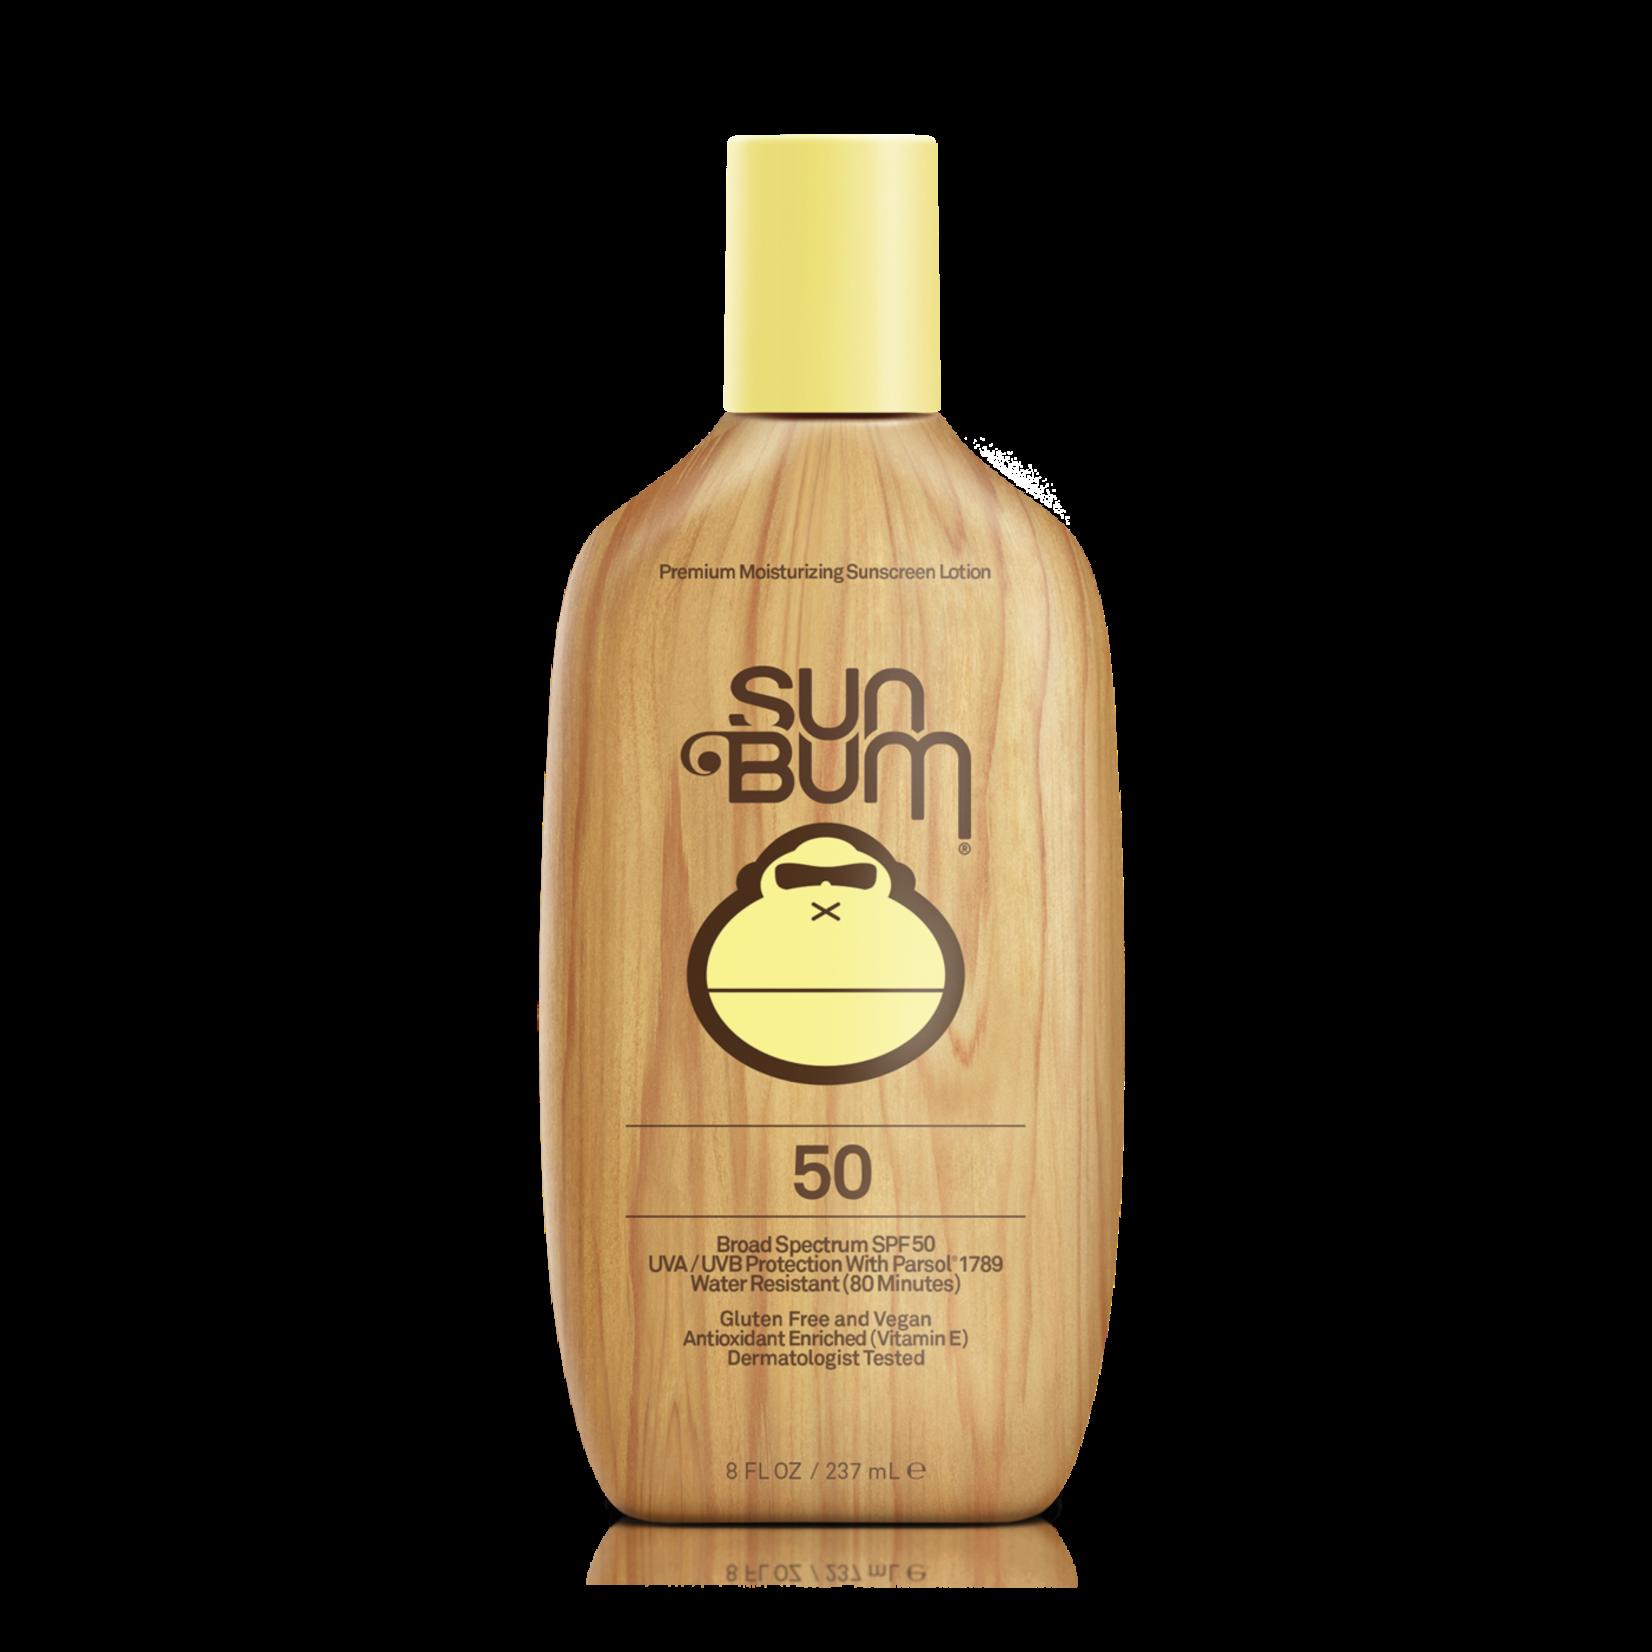 Sun Bum Sun Bum Original SPF Sunscreen Lotion